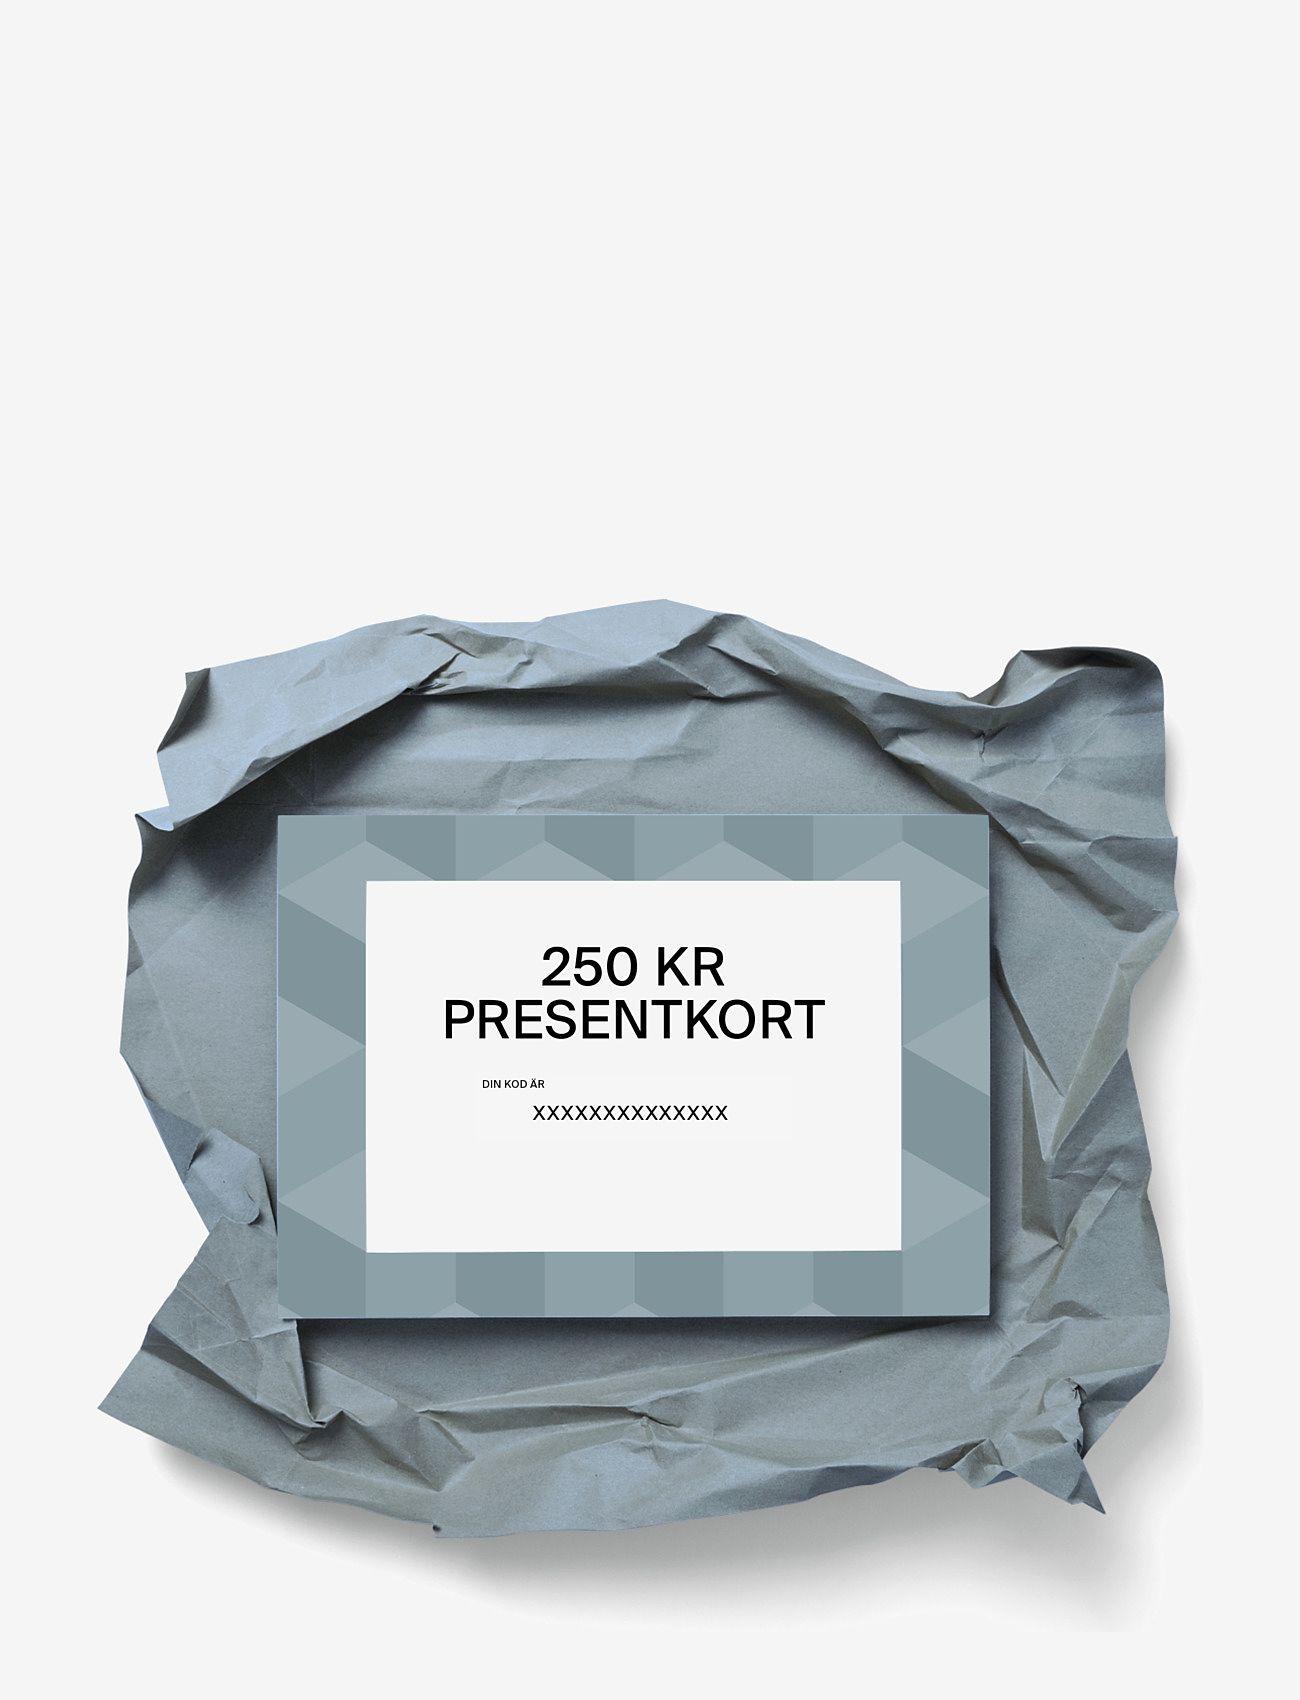 Boozt Gift - Gift card - presentkort - sek 250 - 0